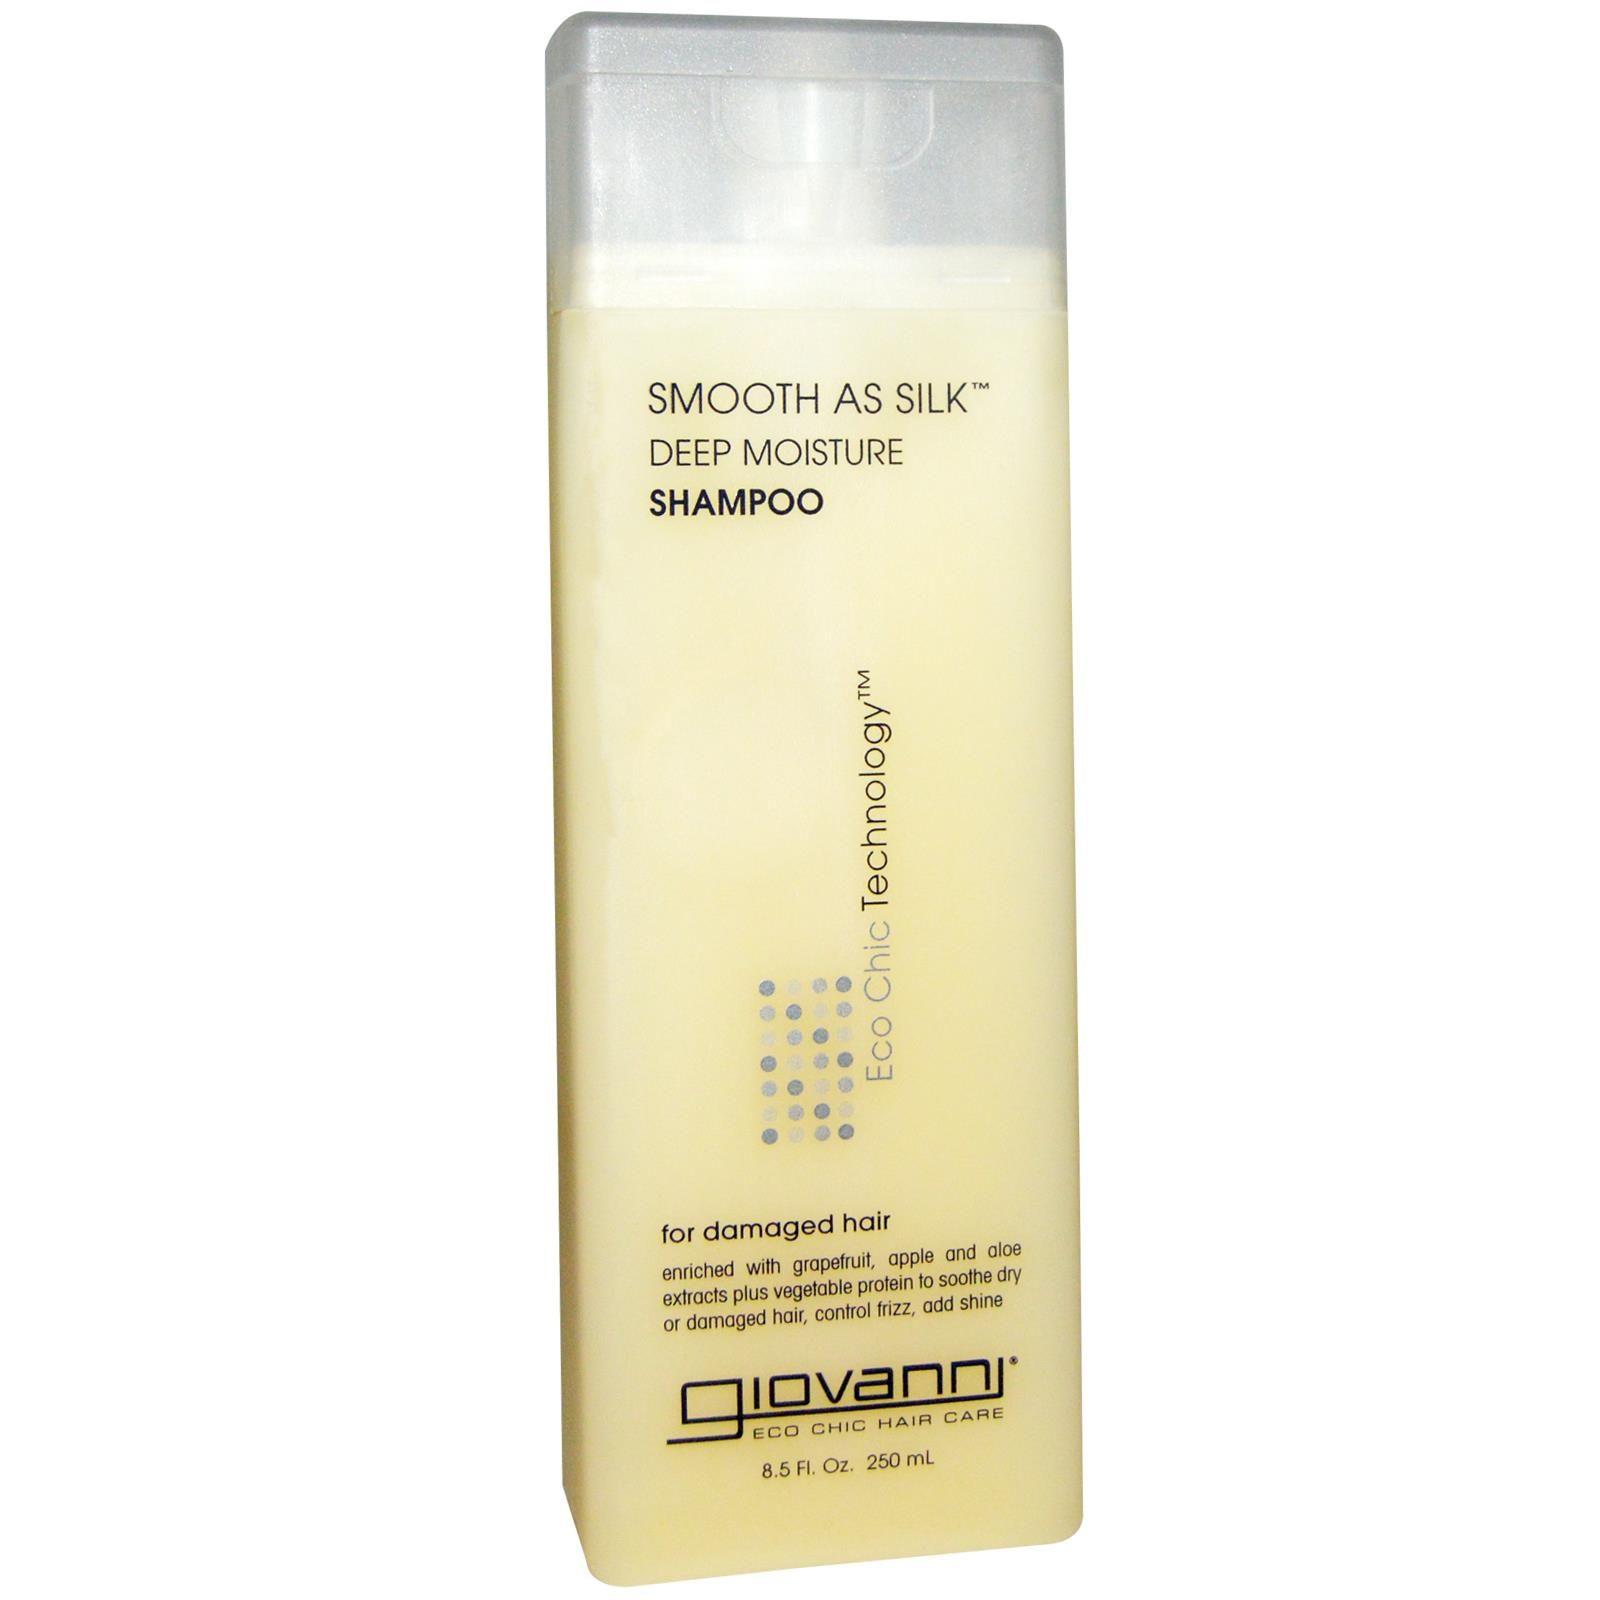 Giovanni, Smooth As Silk, Deep Moisture Shampoo, 8.5 fl oz (250 ml)